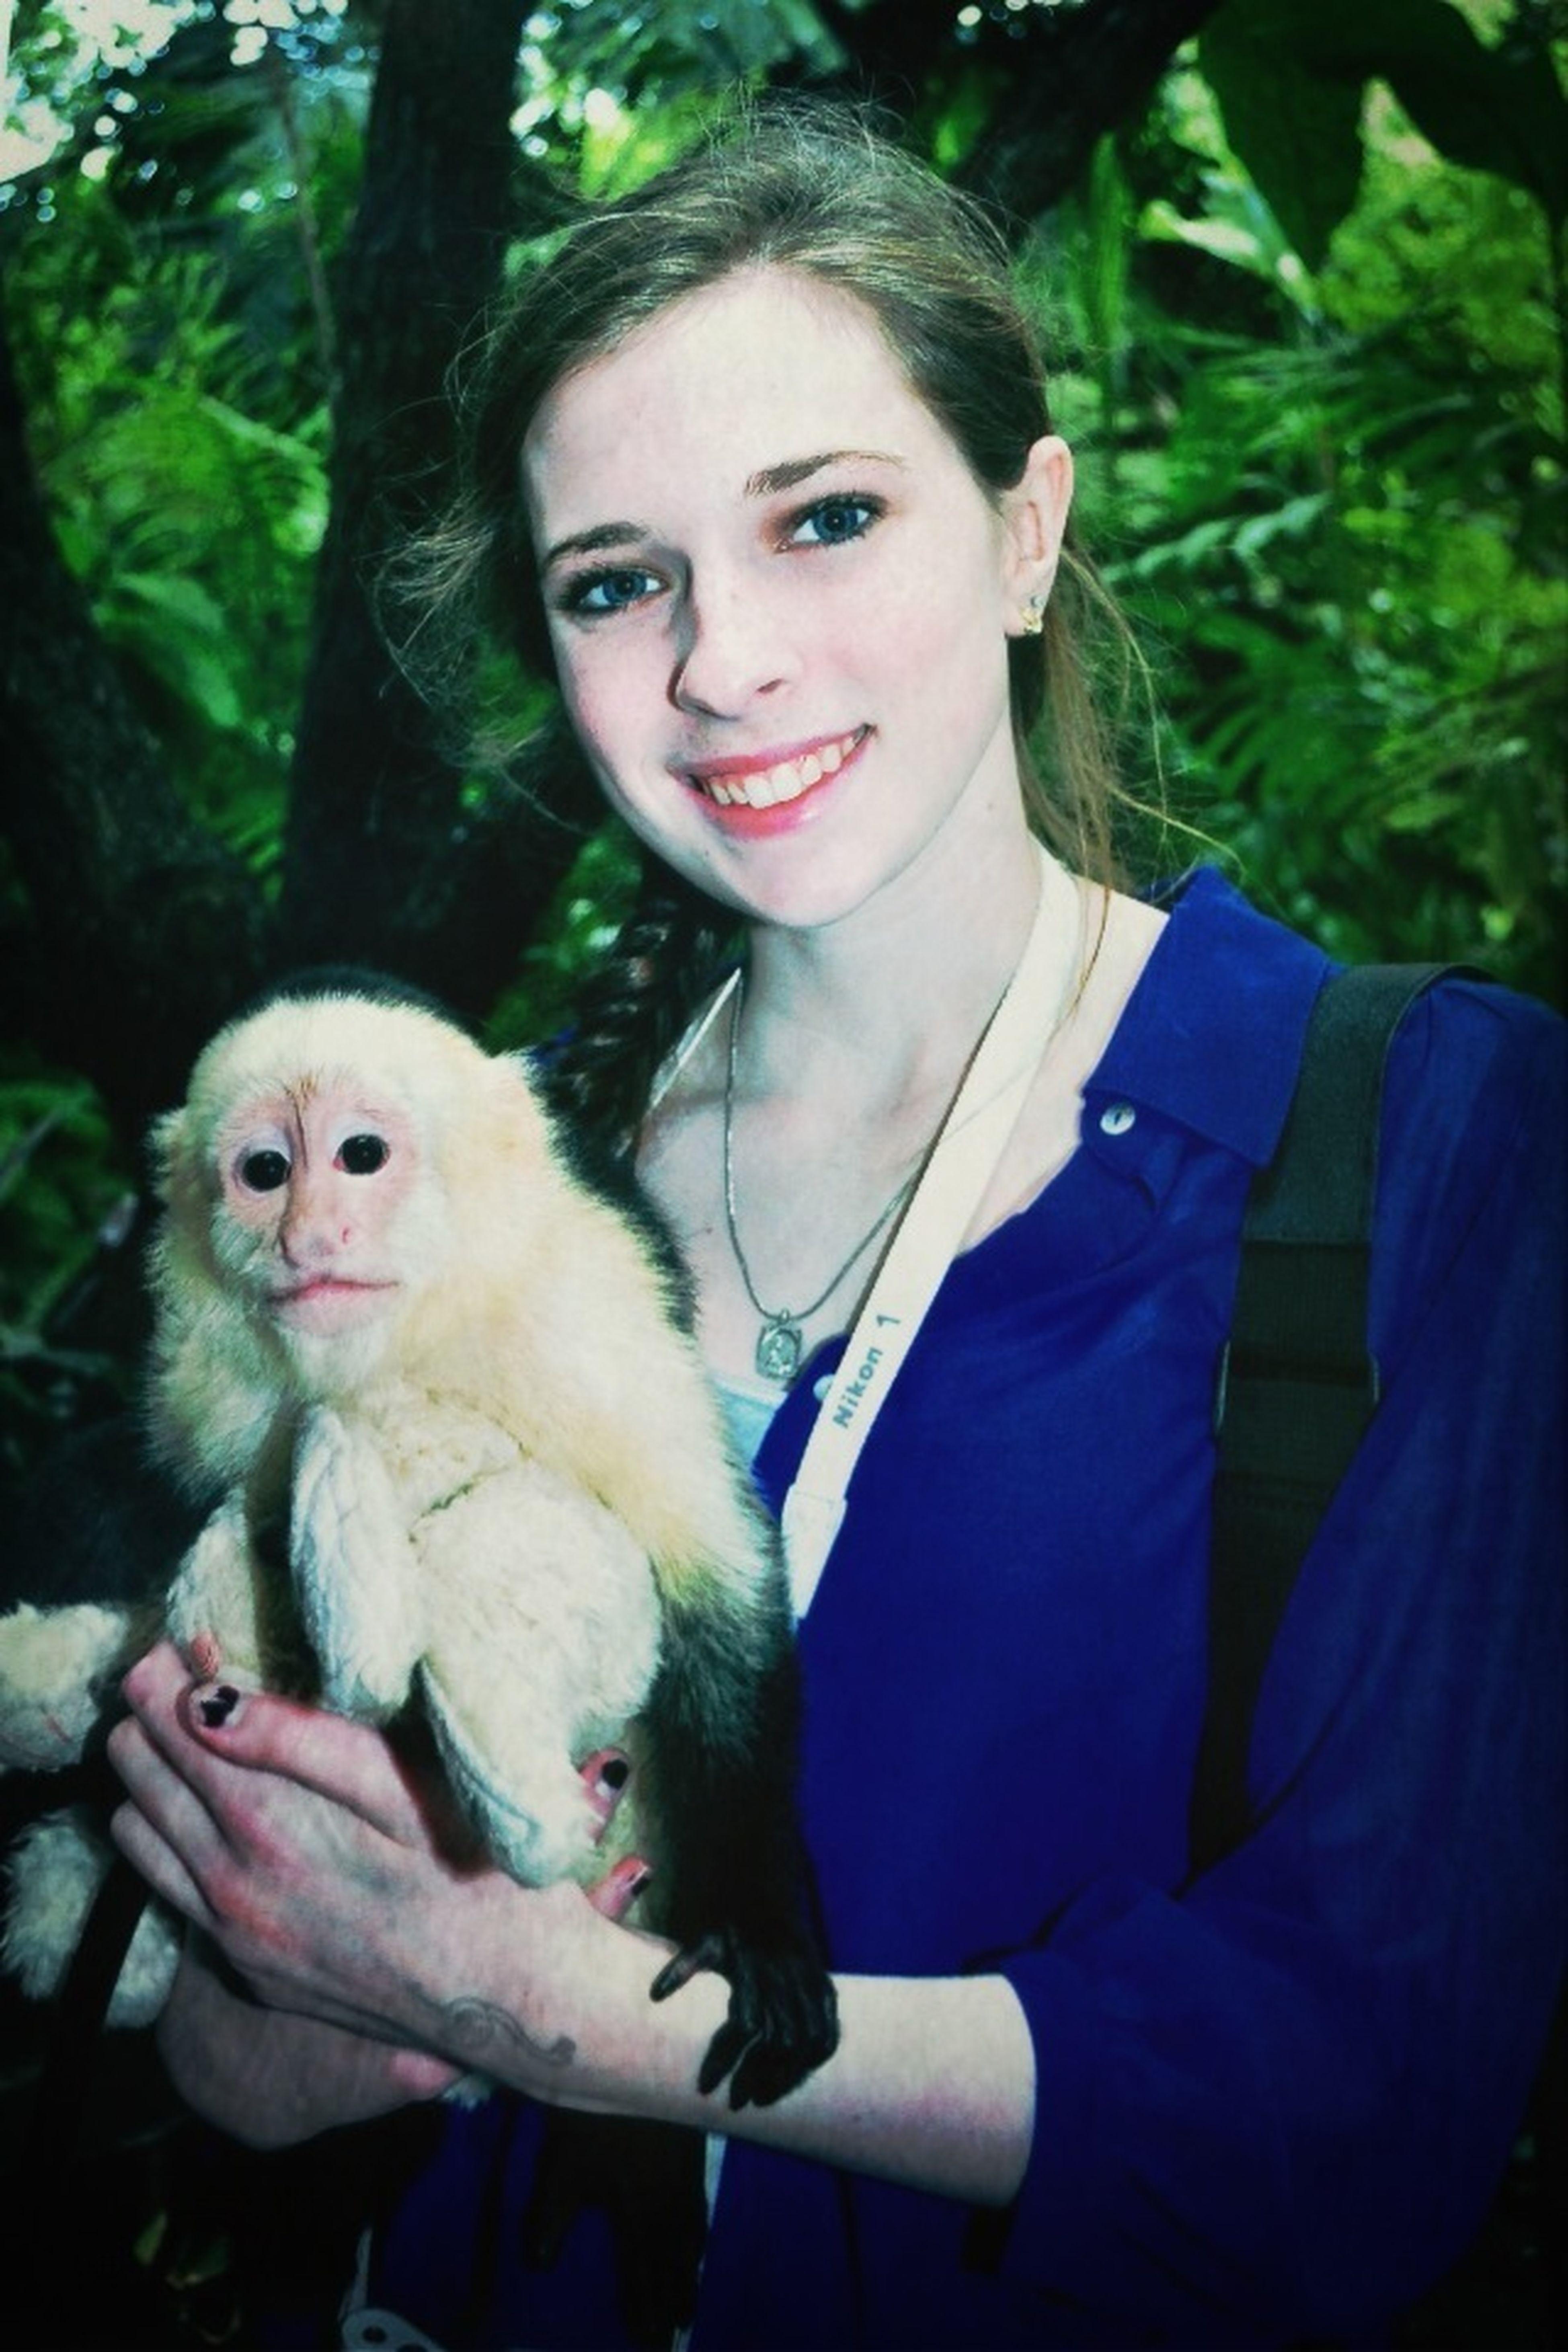 Hey kids, I held a monkey today. ✌